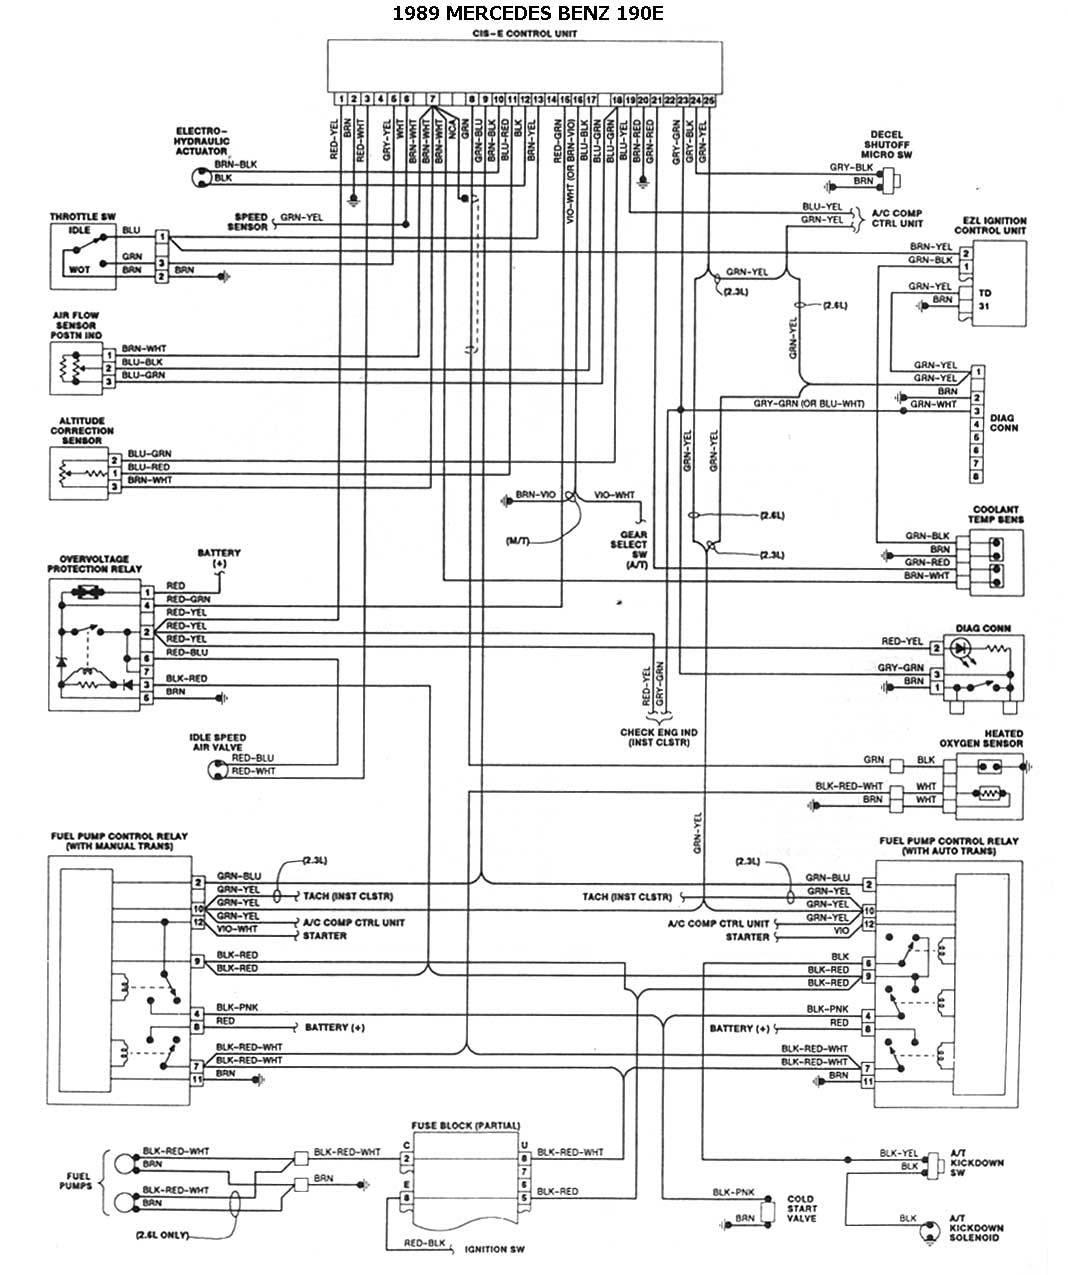 Wiring Diagram De Reparacion Mercedes Benz 190e Gratis